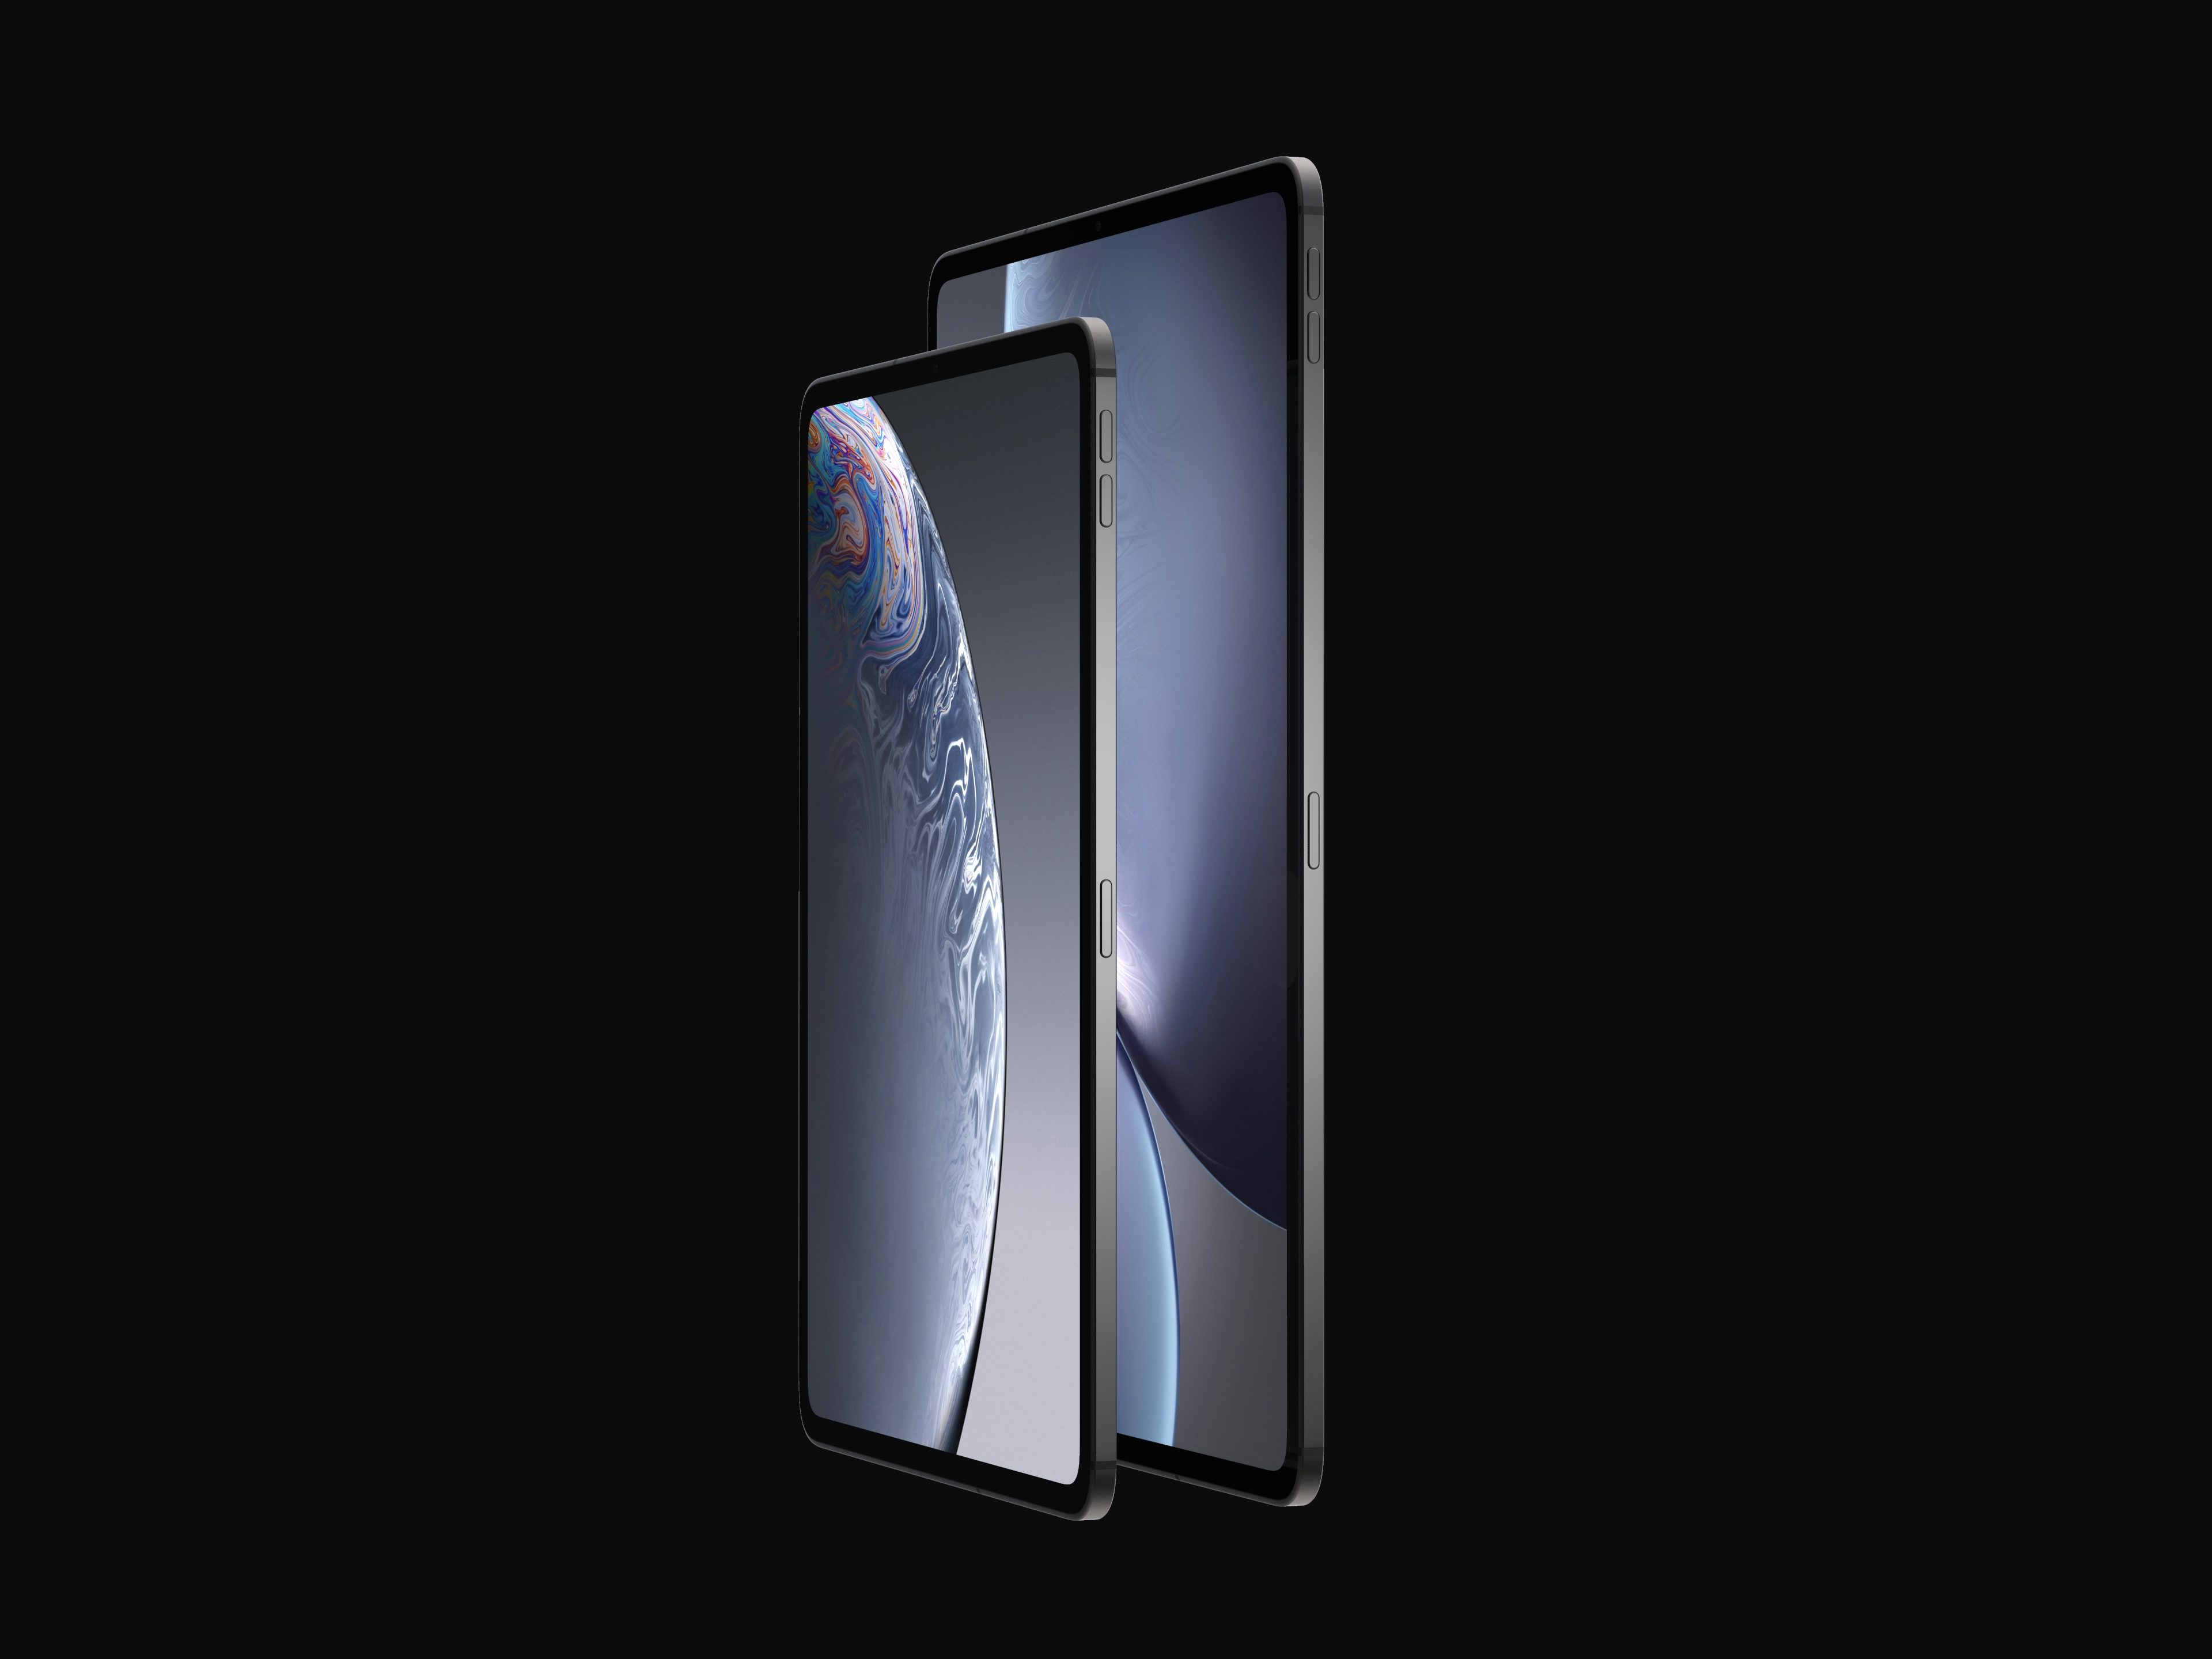 Ipad Pro 2018 Renders Img 3